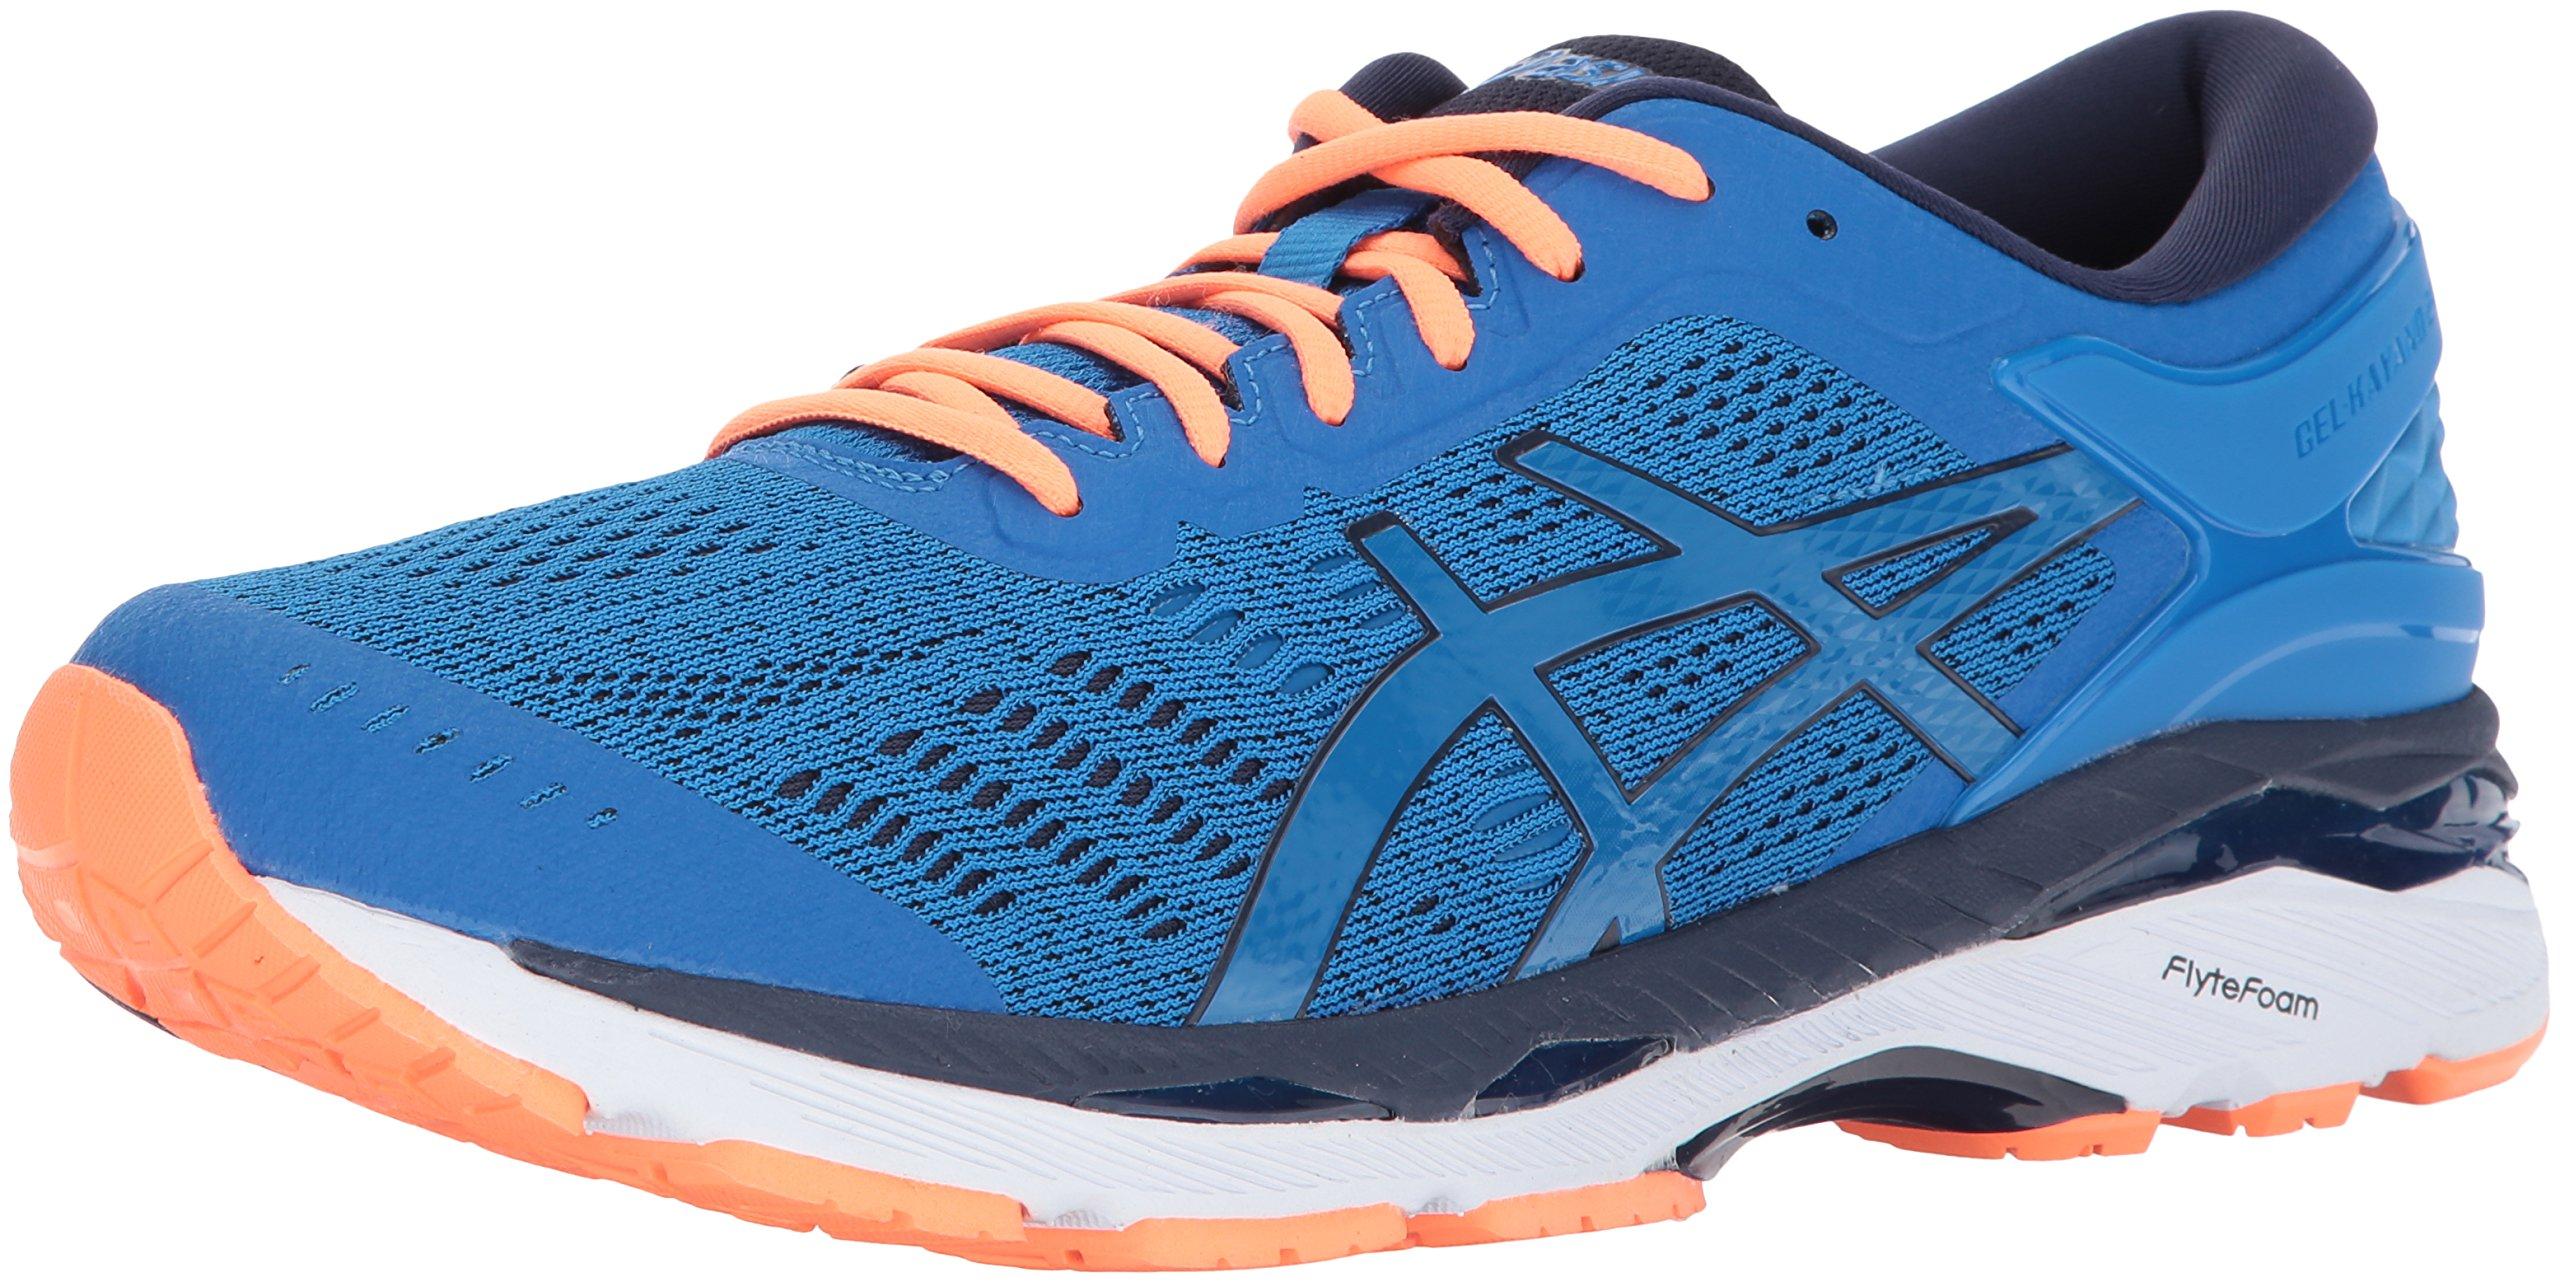 ASICS Mens Gel-Kayano 24 Running Shoe Directoire Blue/Peacoat/Hot Orange 6 Medium US